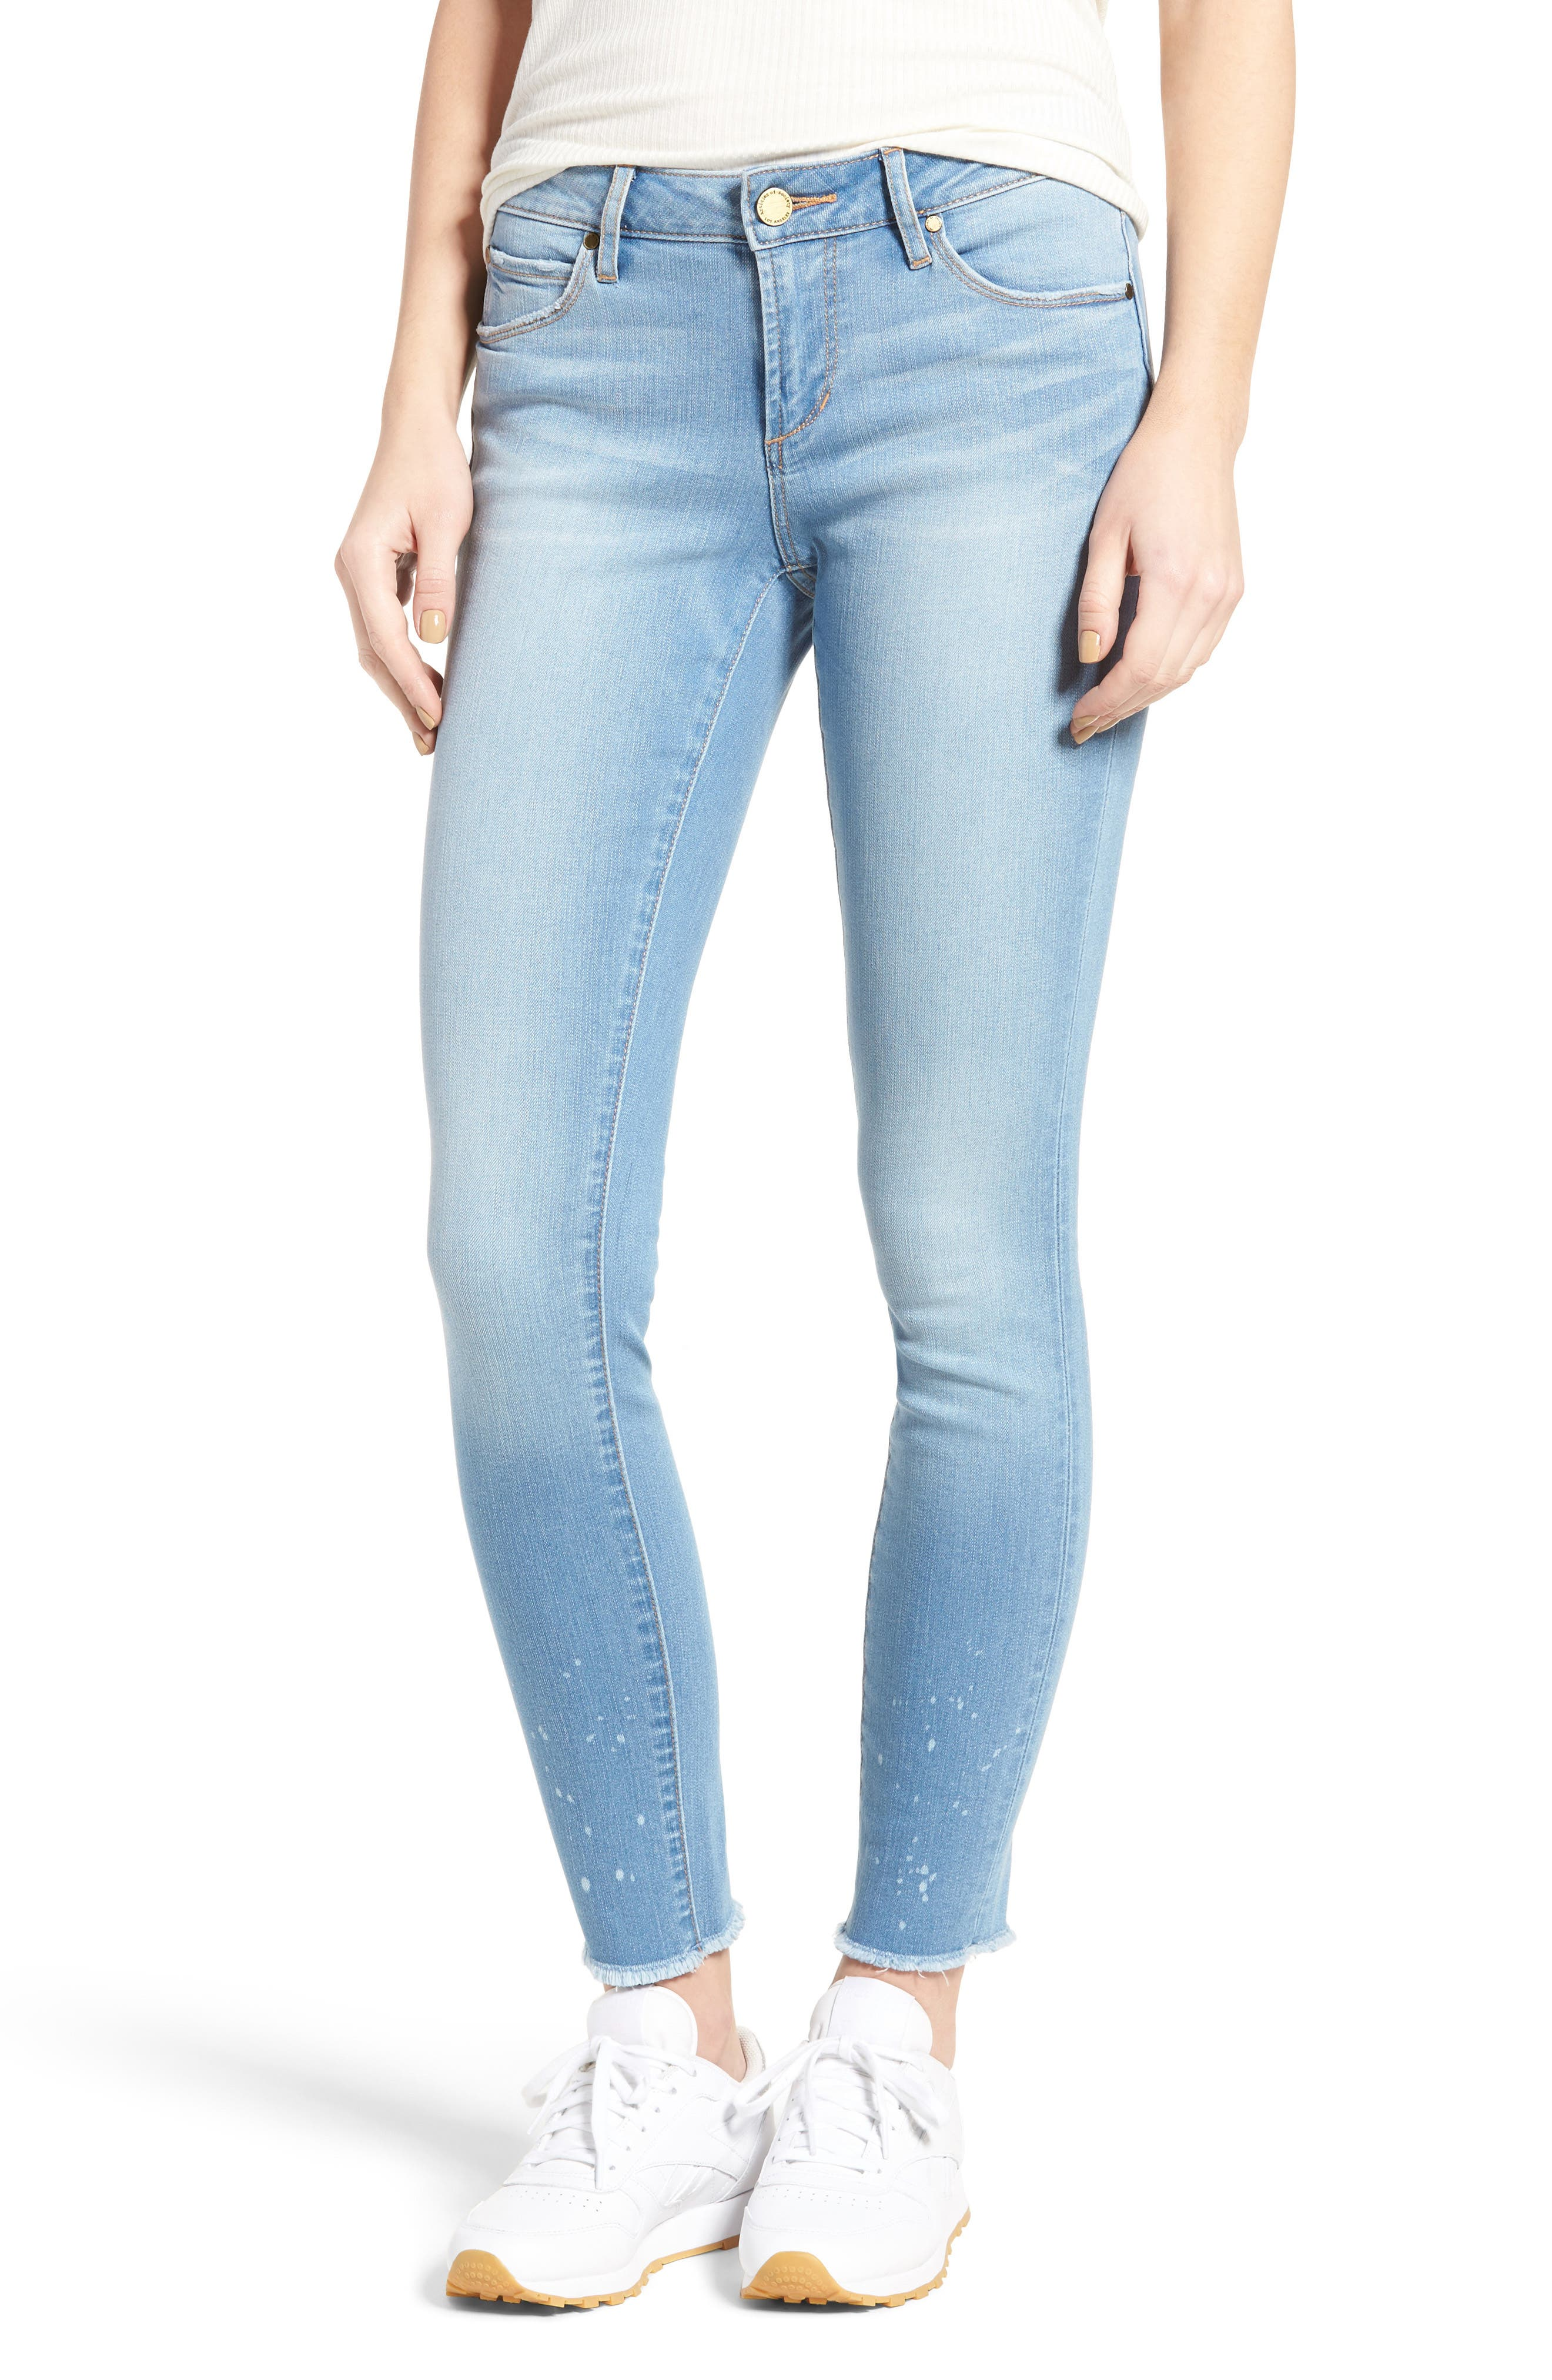 Main Image - Articles of Society Sarah Skinny Jeans (Bay)